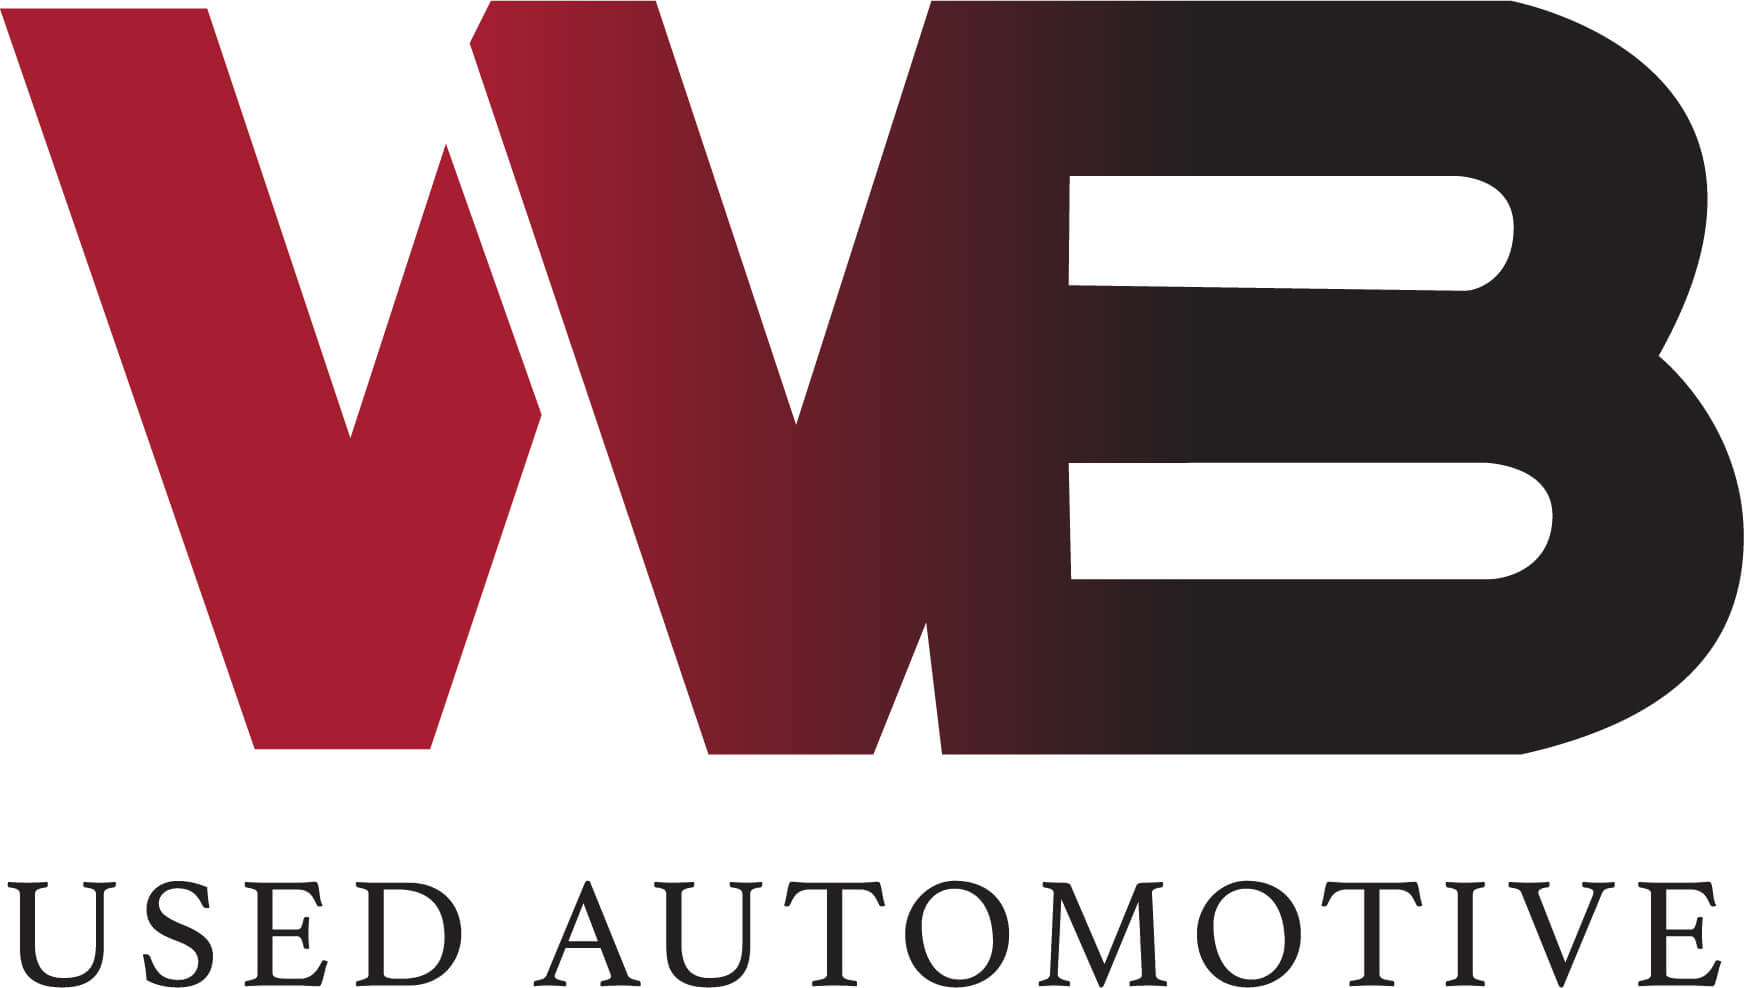 WB Used Automotive